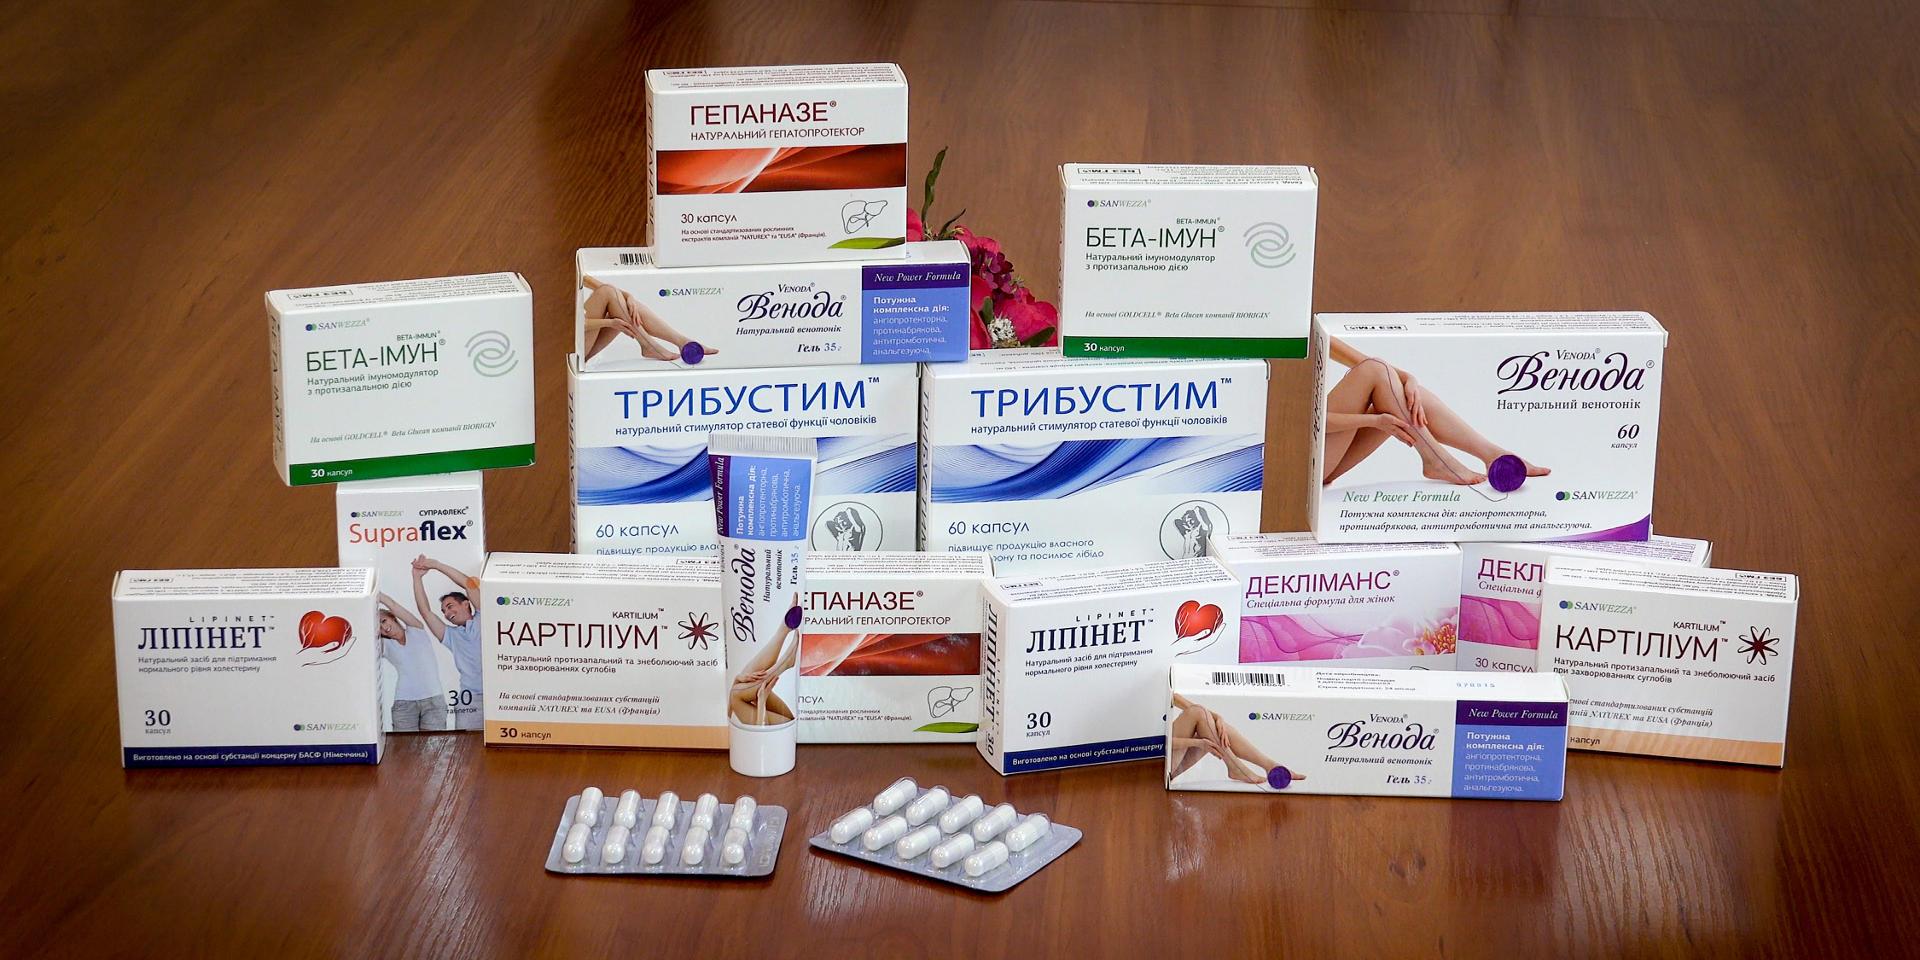 Разработка дизайна фармацевтической упаковки, Development of pharmaceutical packaging design